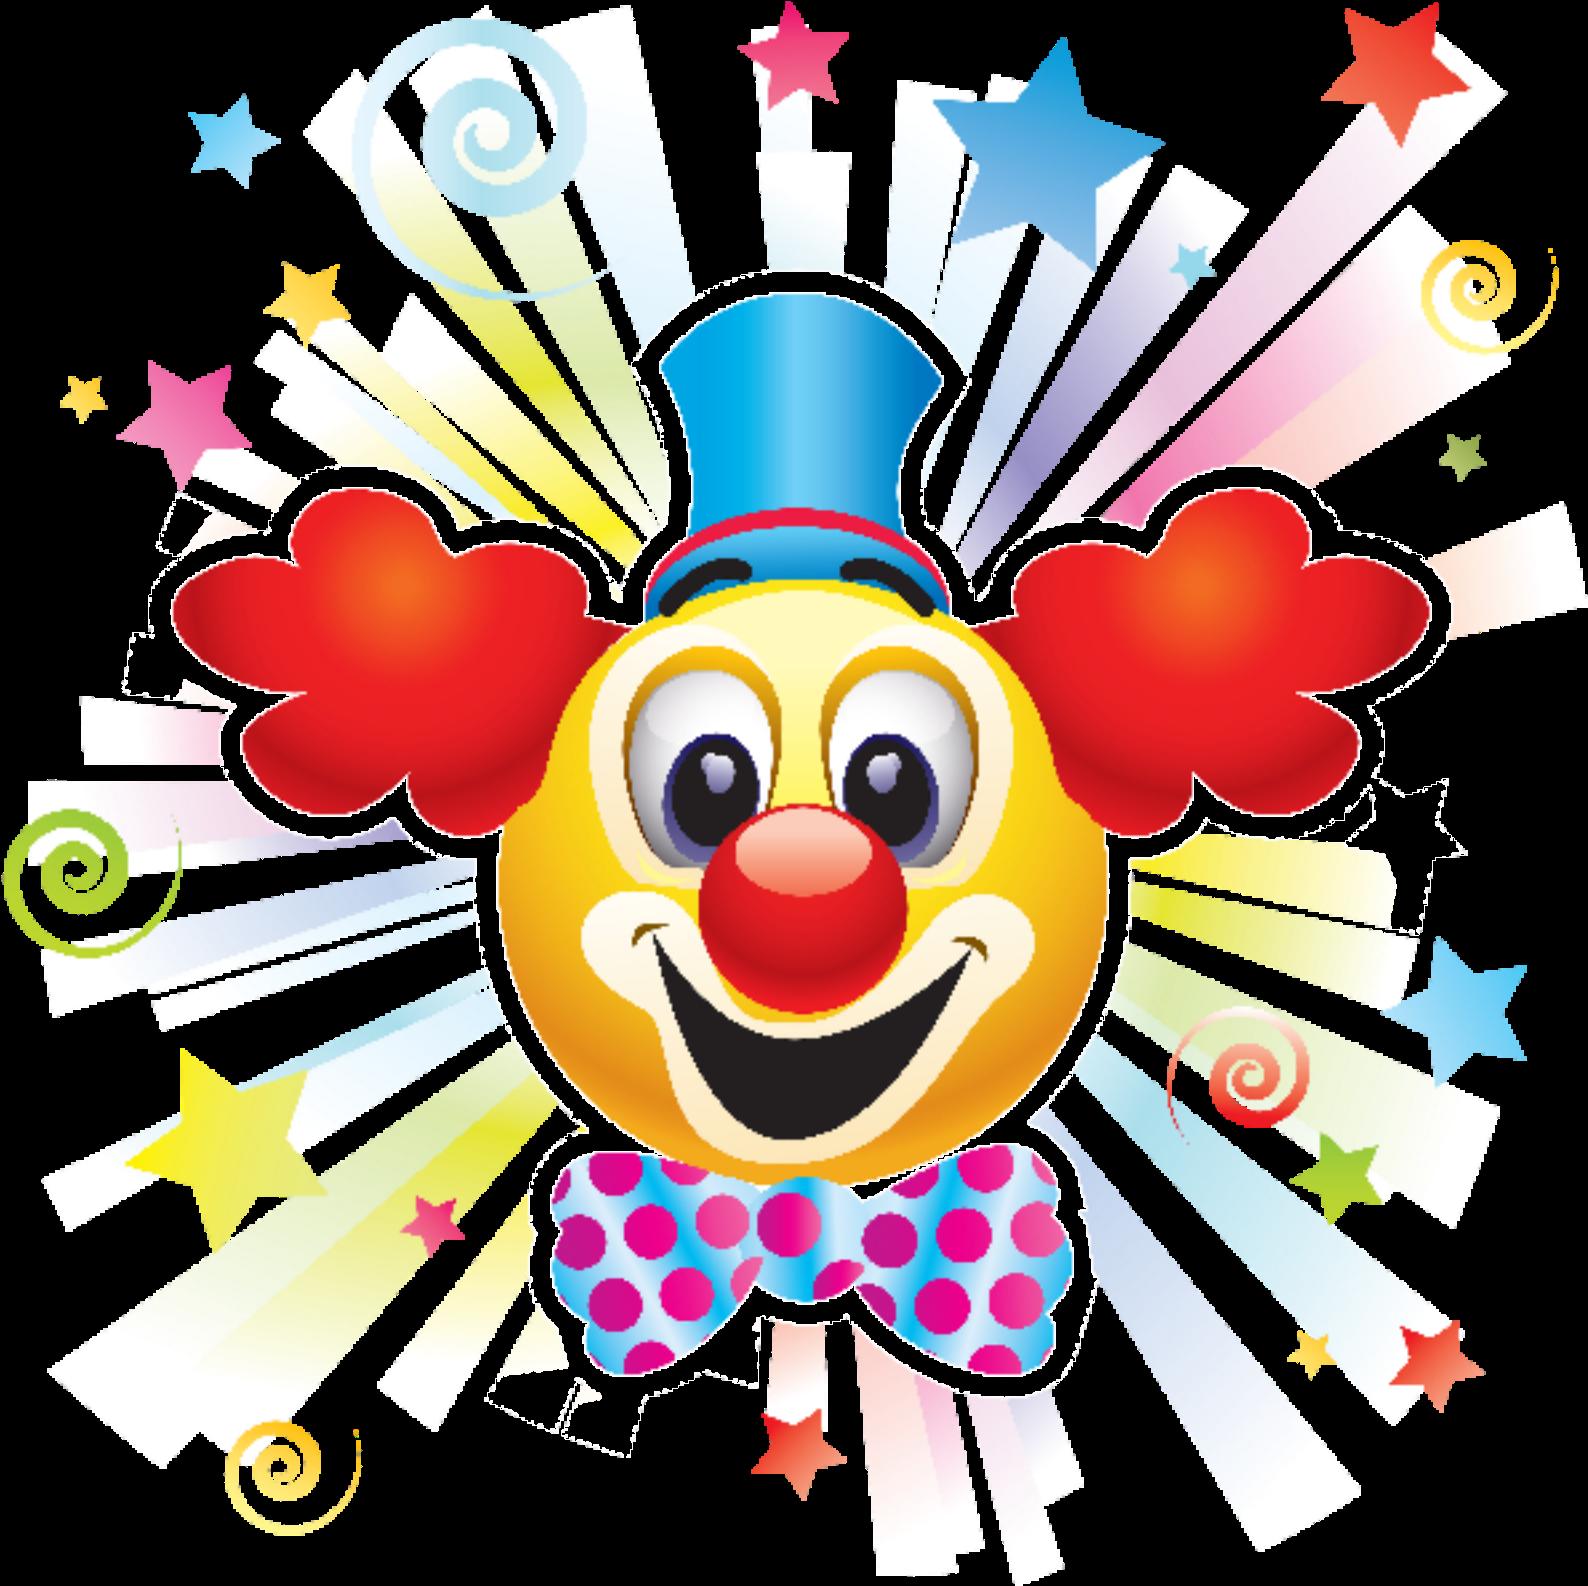 Открытки с клоуном, субботнике детском